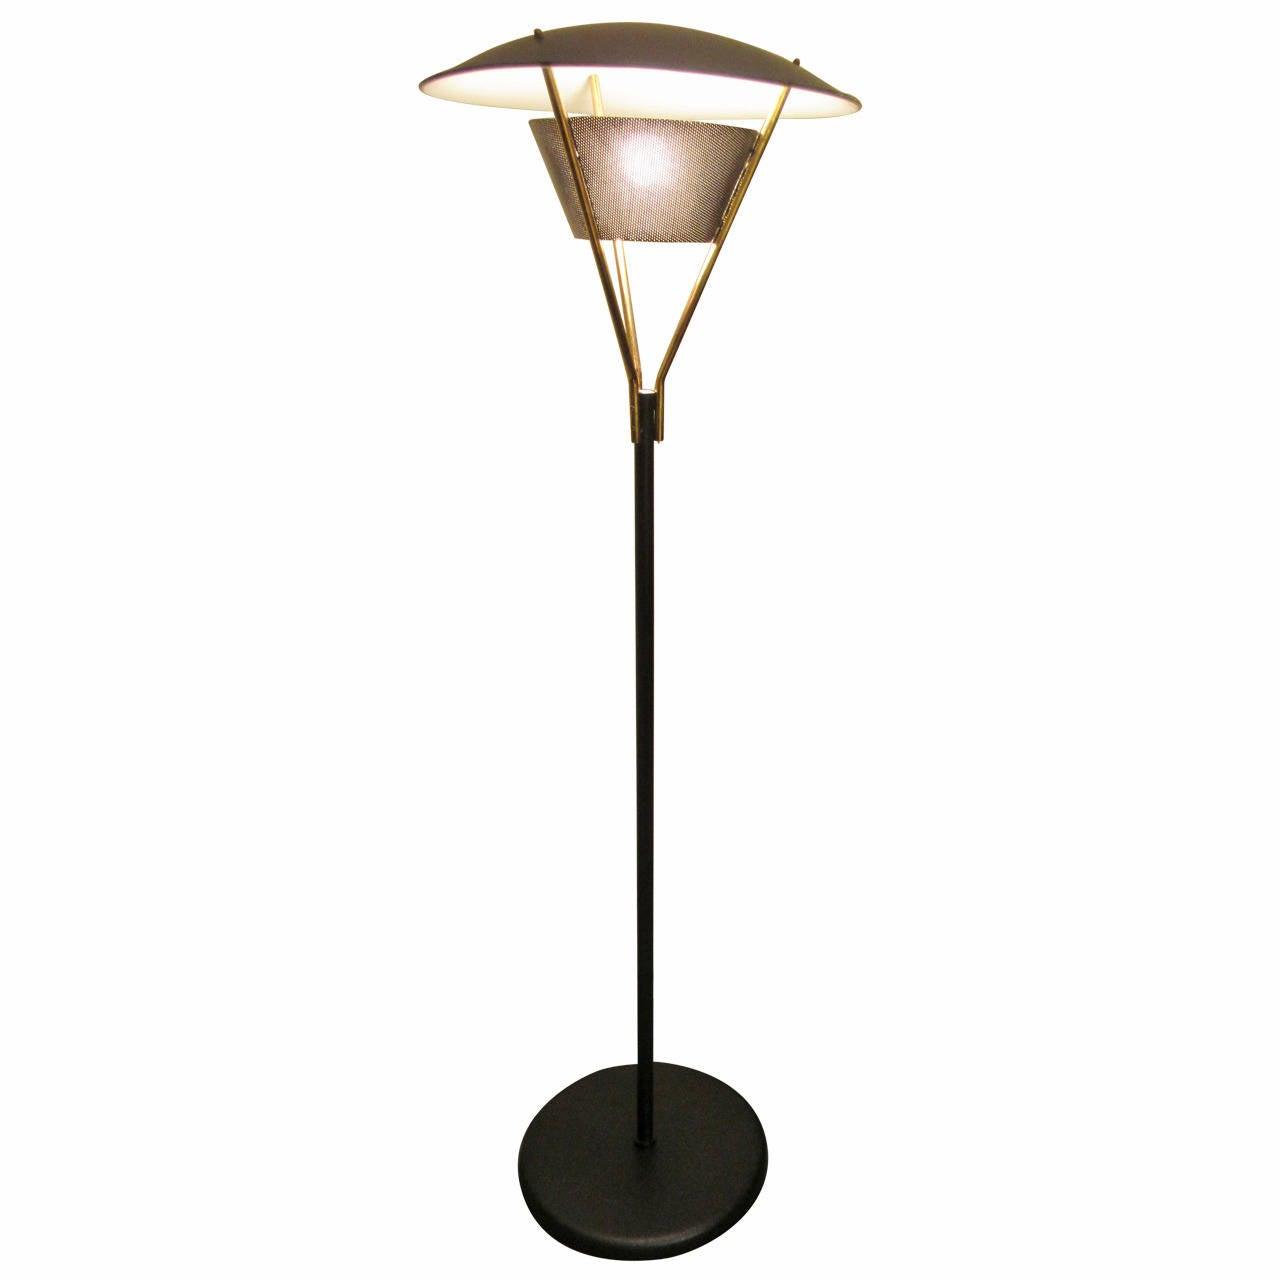 gerald thurston lightolier outdoor floor lamp at 1stdibs. Black Bedroom Furniture Sets. Home Design Ideas